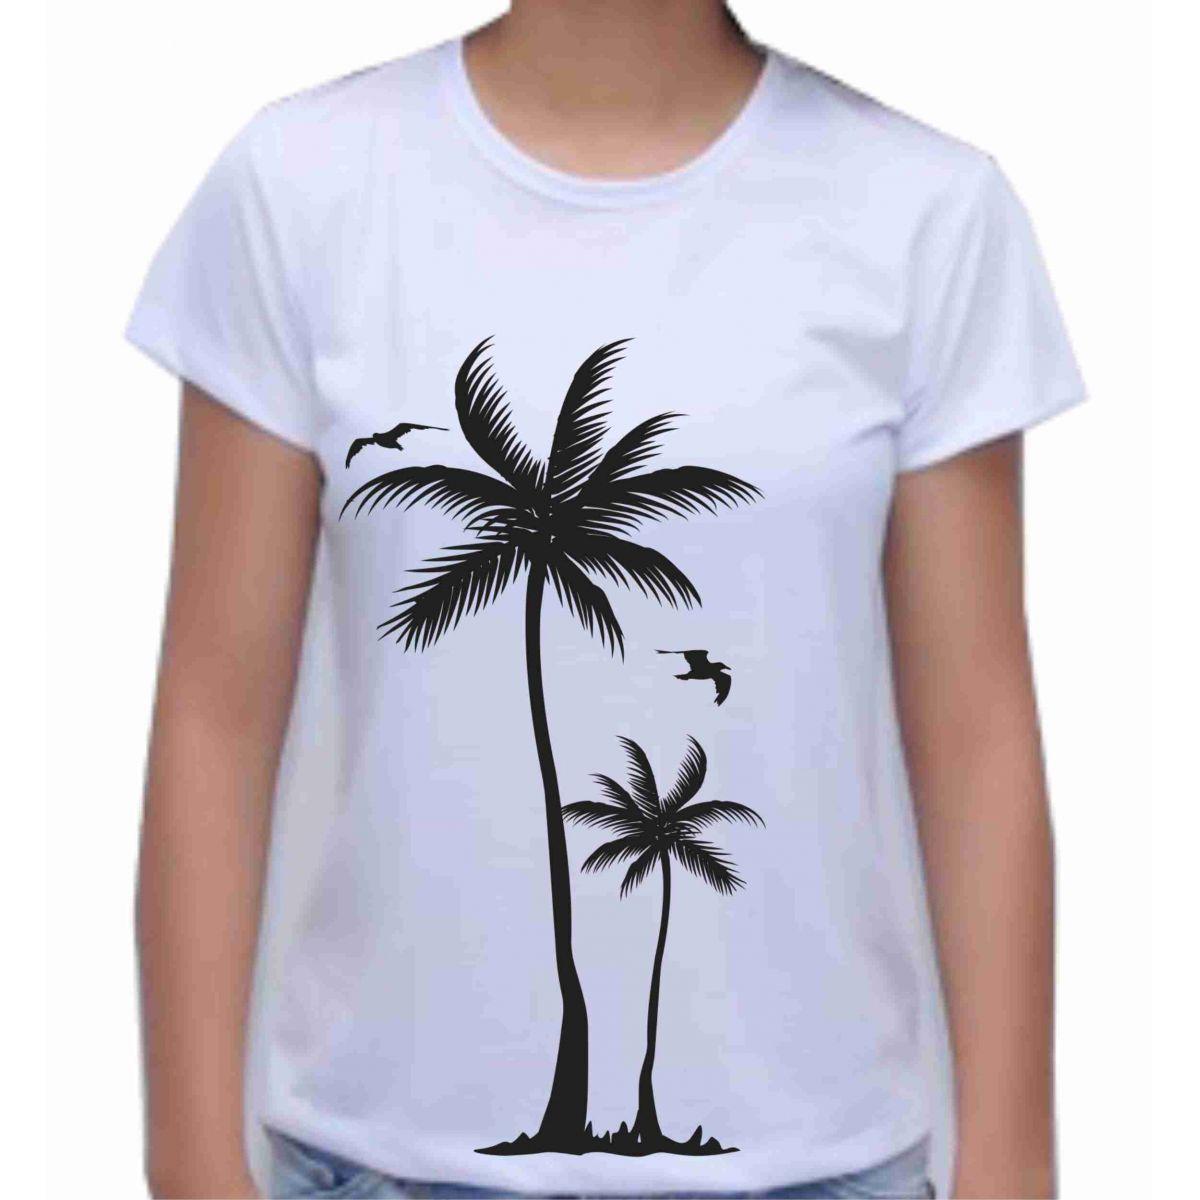 Camiseta coqueiro  - Fábrica de Camisetas Impakto